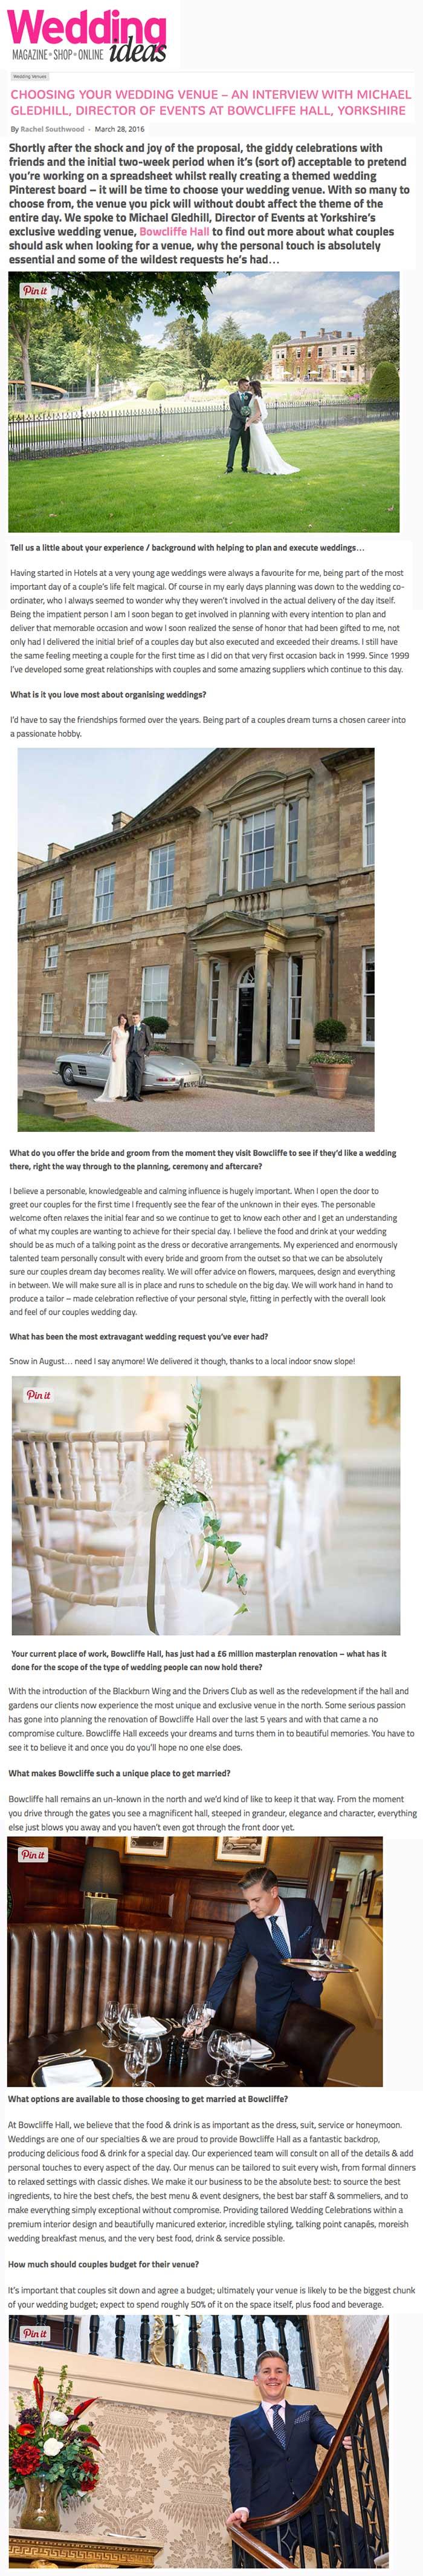 Wedding Ideas Michael Gledhill